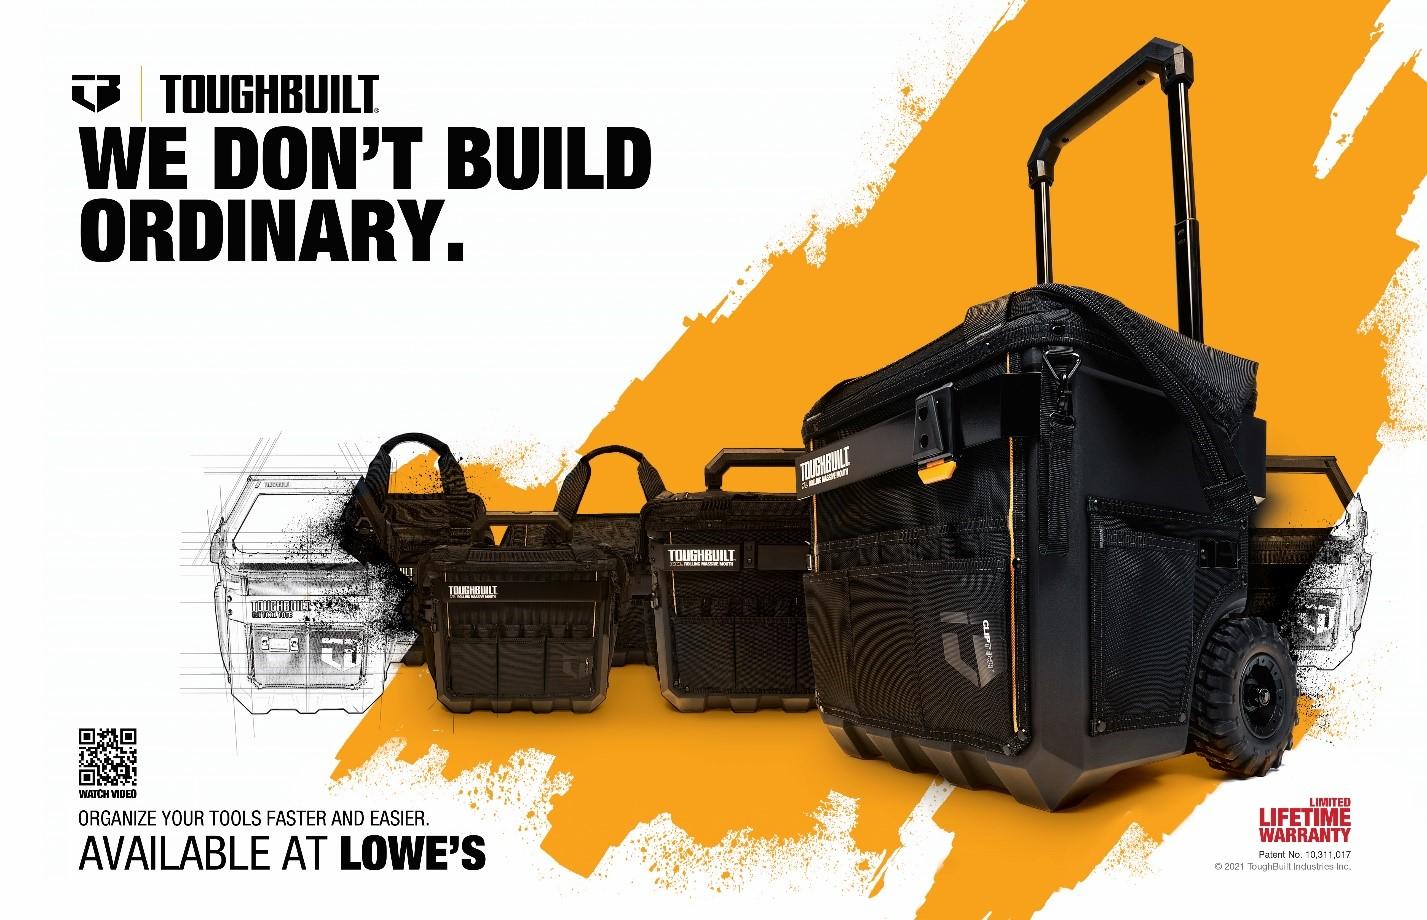 TOUGHBUILT™ LAUNCHES 14 NEW TOOL ORGANIZATION SKUs AT LOWE'S NATIONWIDE — ToughBuilt Industries, Inc. (TBLT)